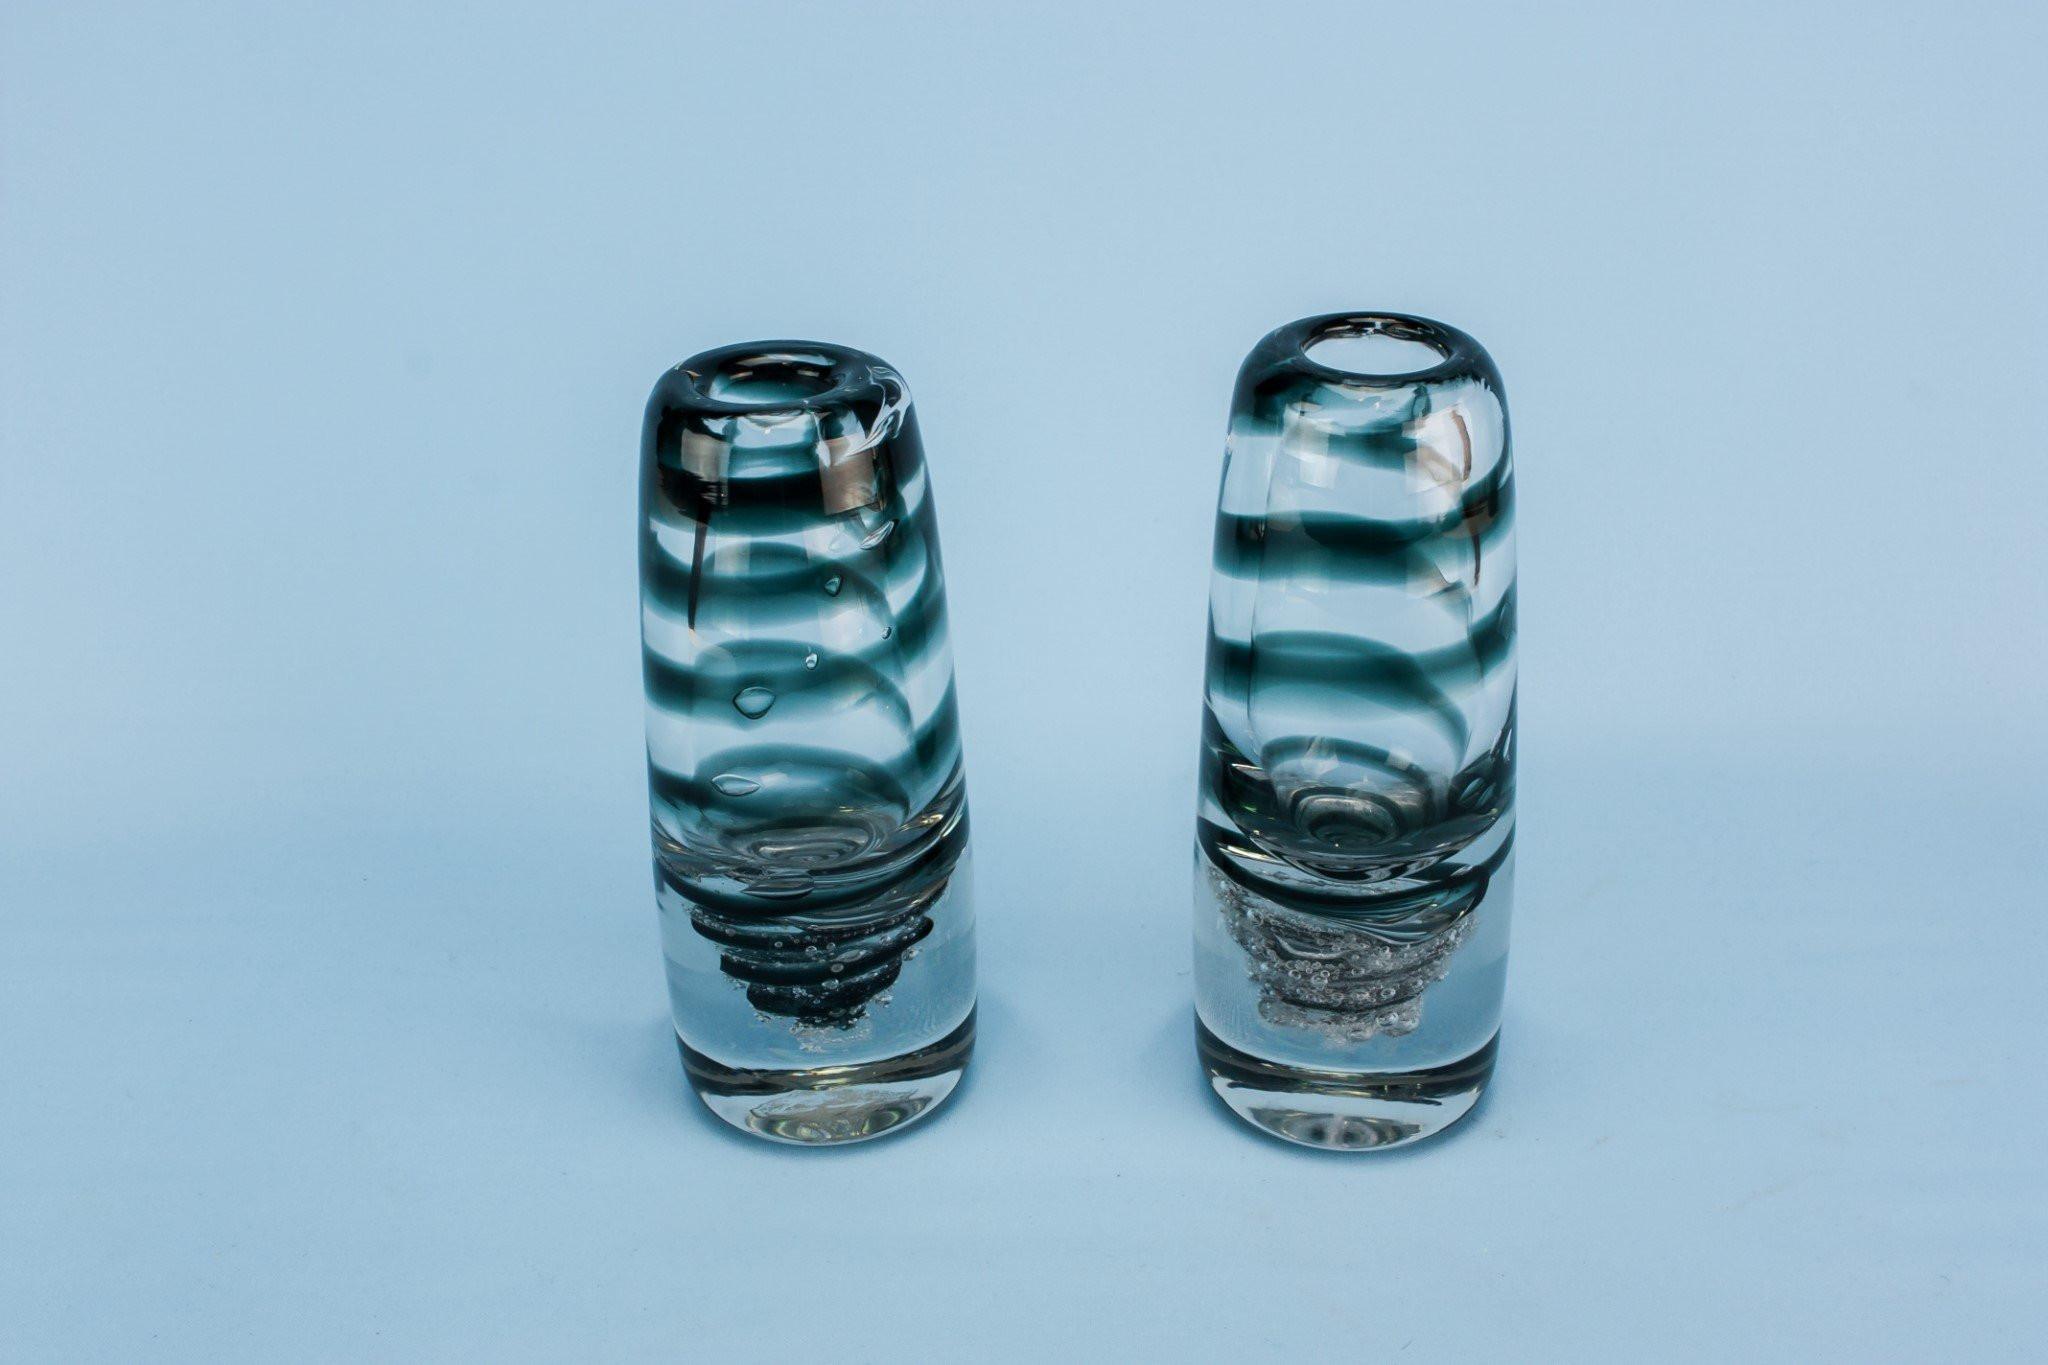 bohemia crystal glass vase of 17 fresh antique blue glass vases bogekompresorturkiye com for 2 glass vases